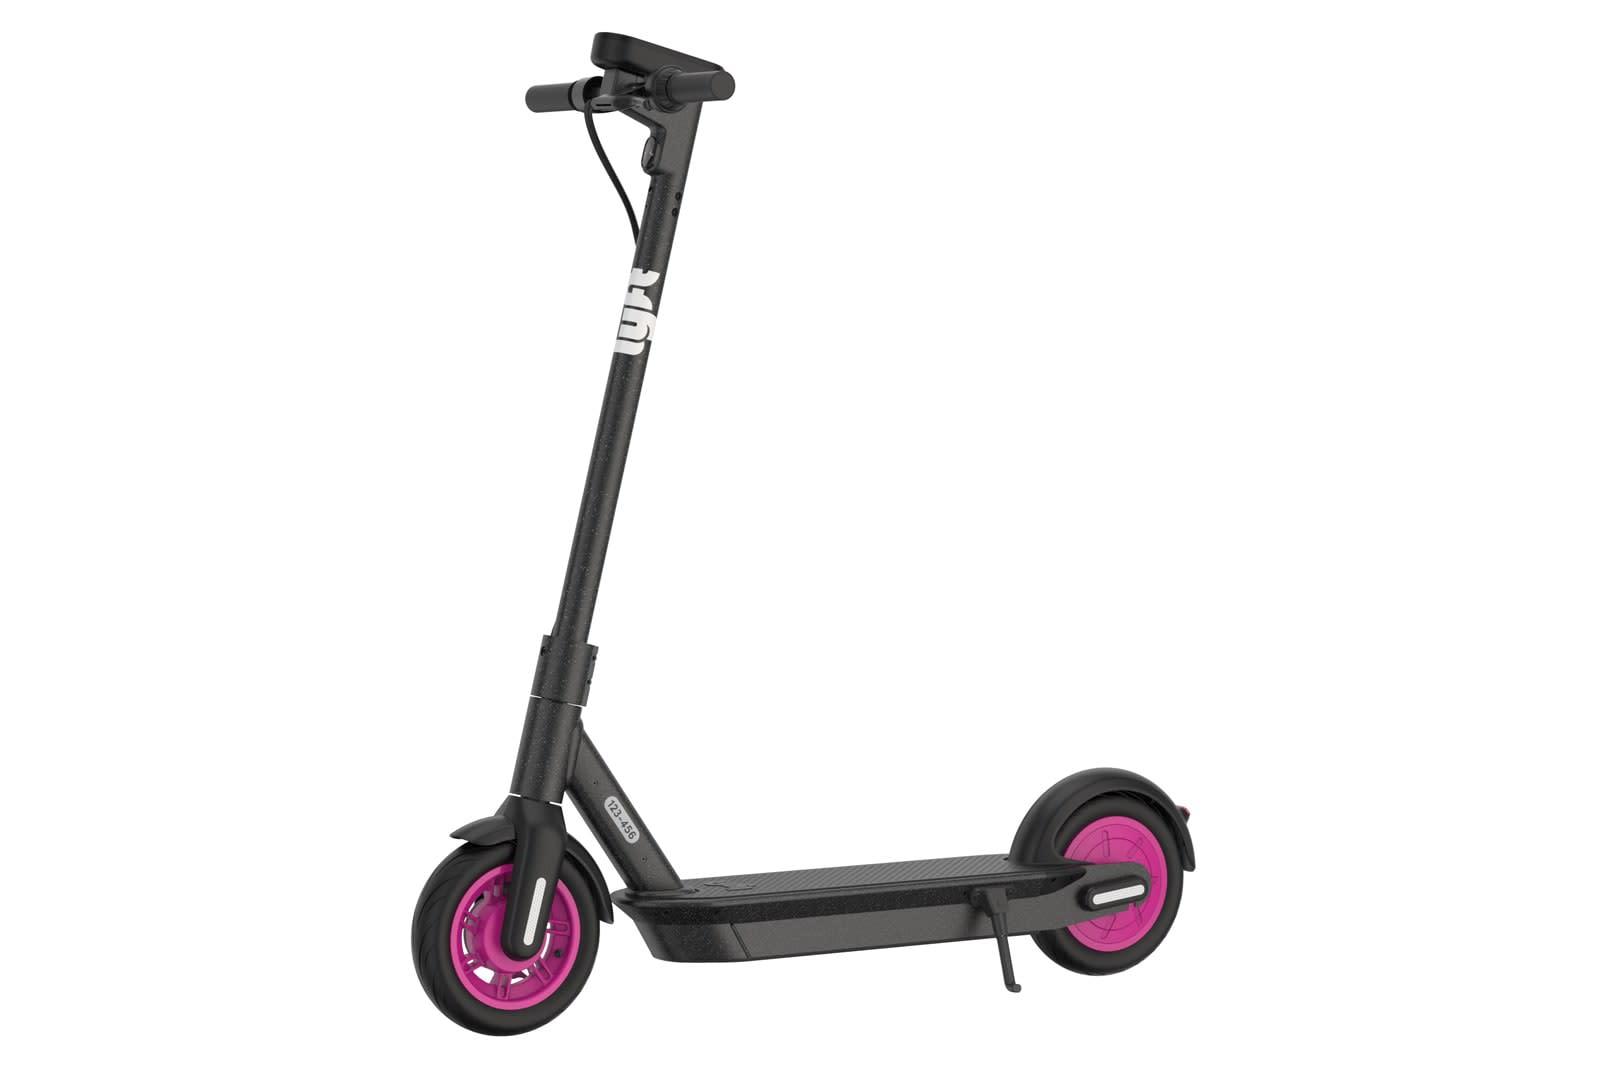 Flipboard: Lyft built a scooter for sharing that's tougher